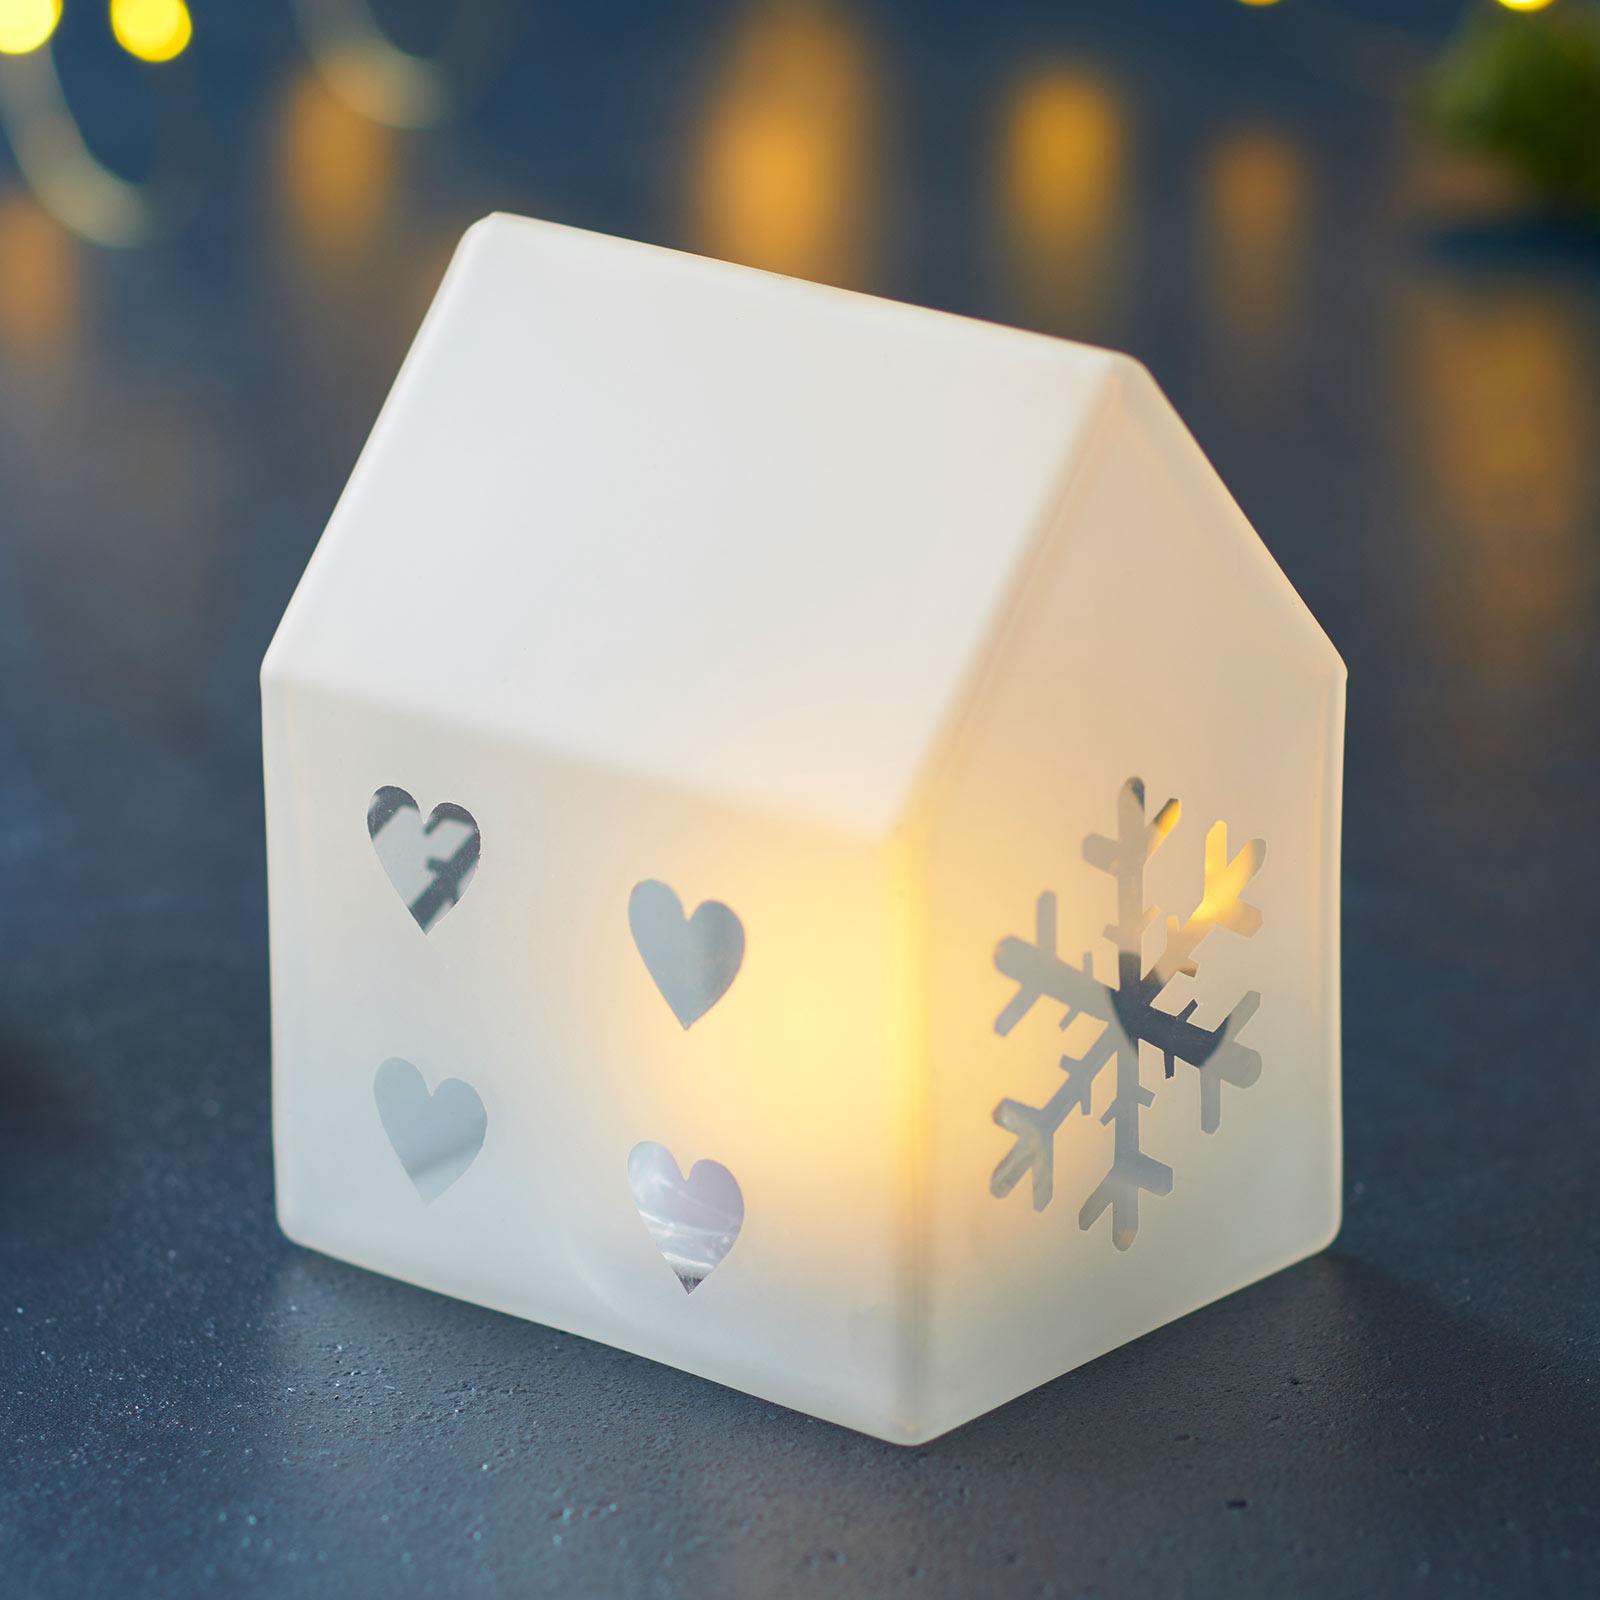 Lámpara decorativa LED Santa House, altura 10 cm